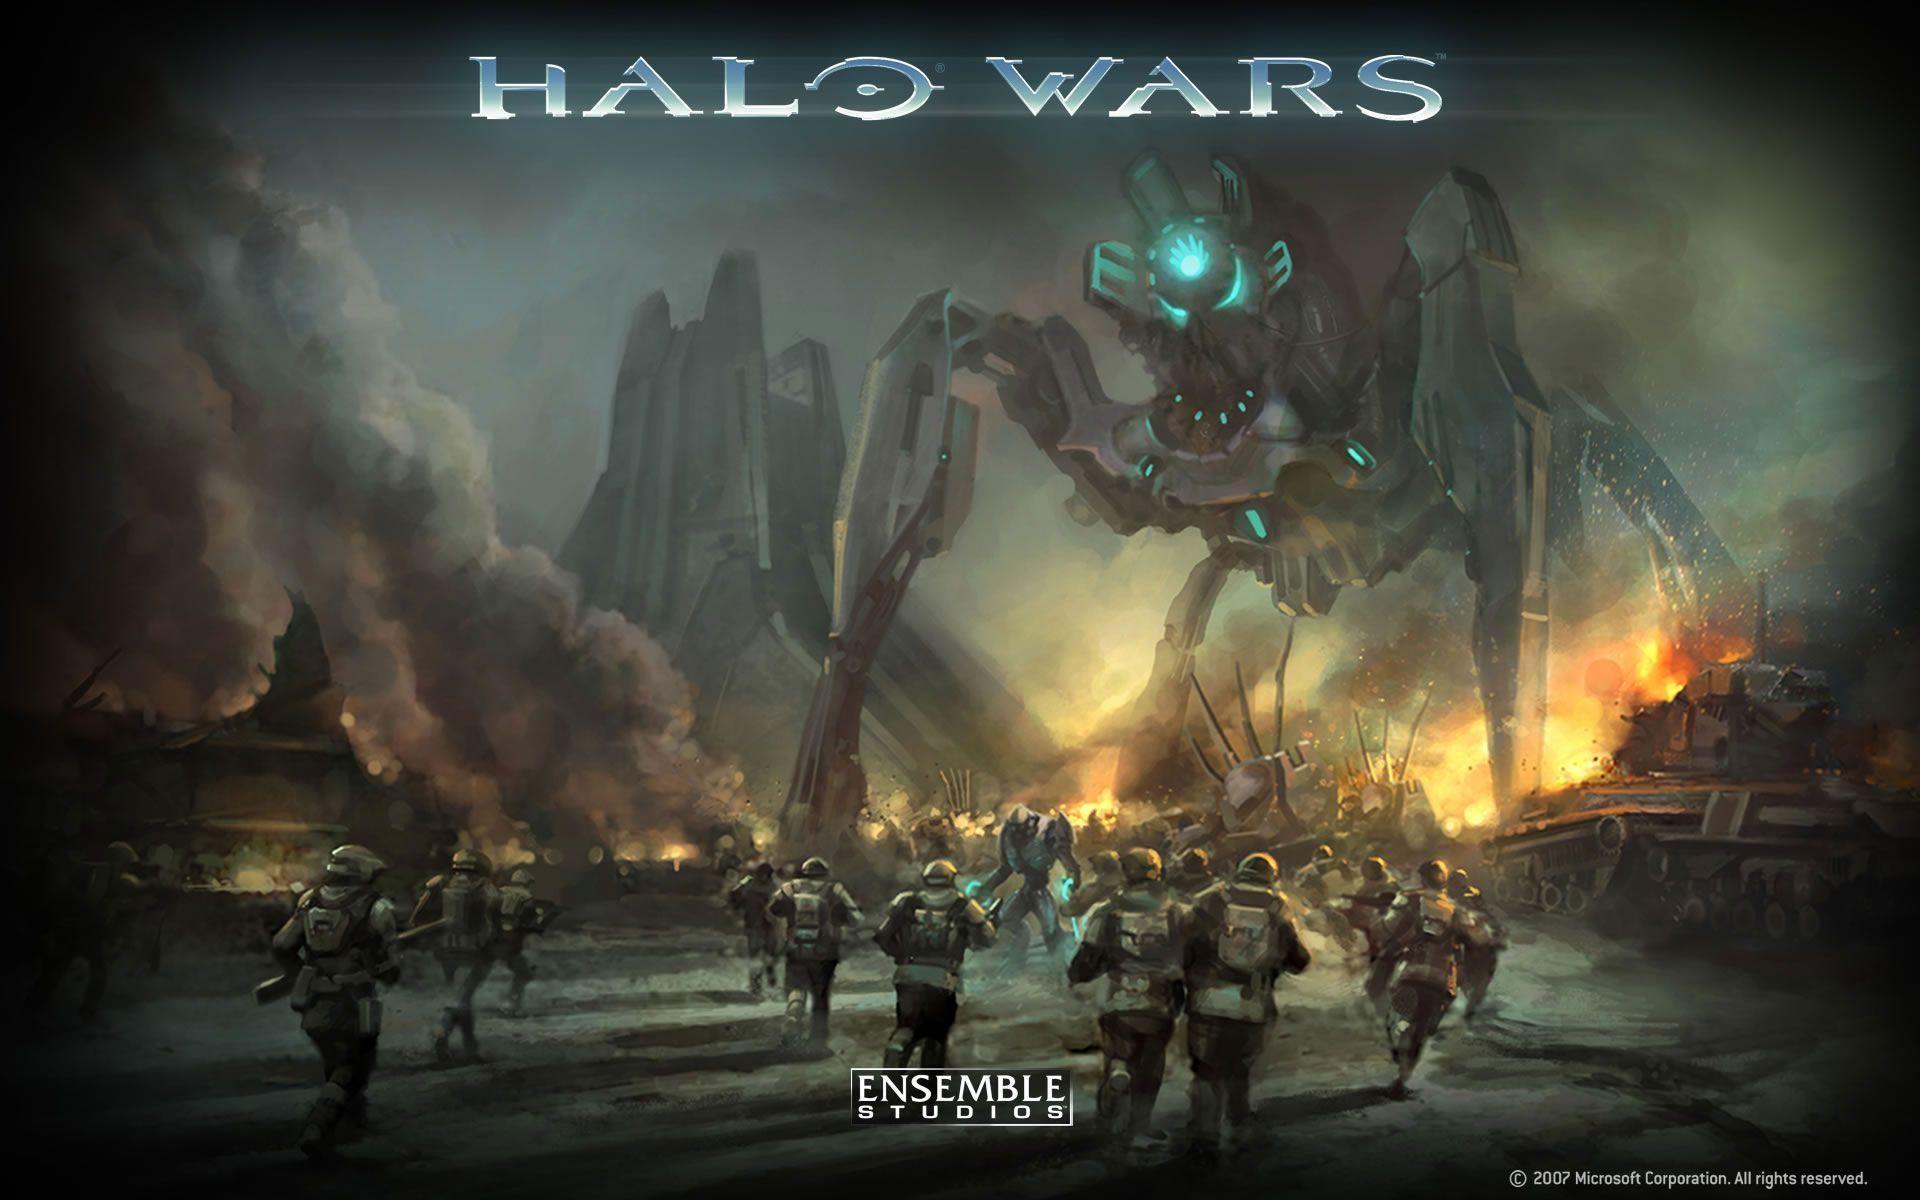 Halo arbiter wallpapers wallpaper cave - Wallpaper halo wars ...